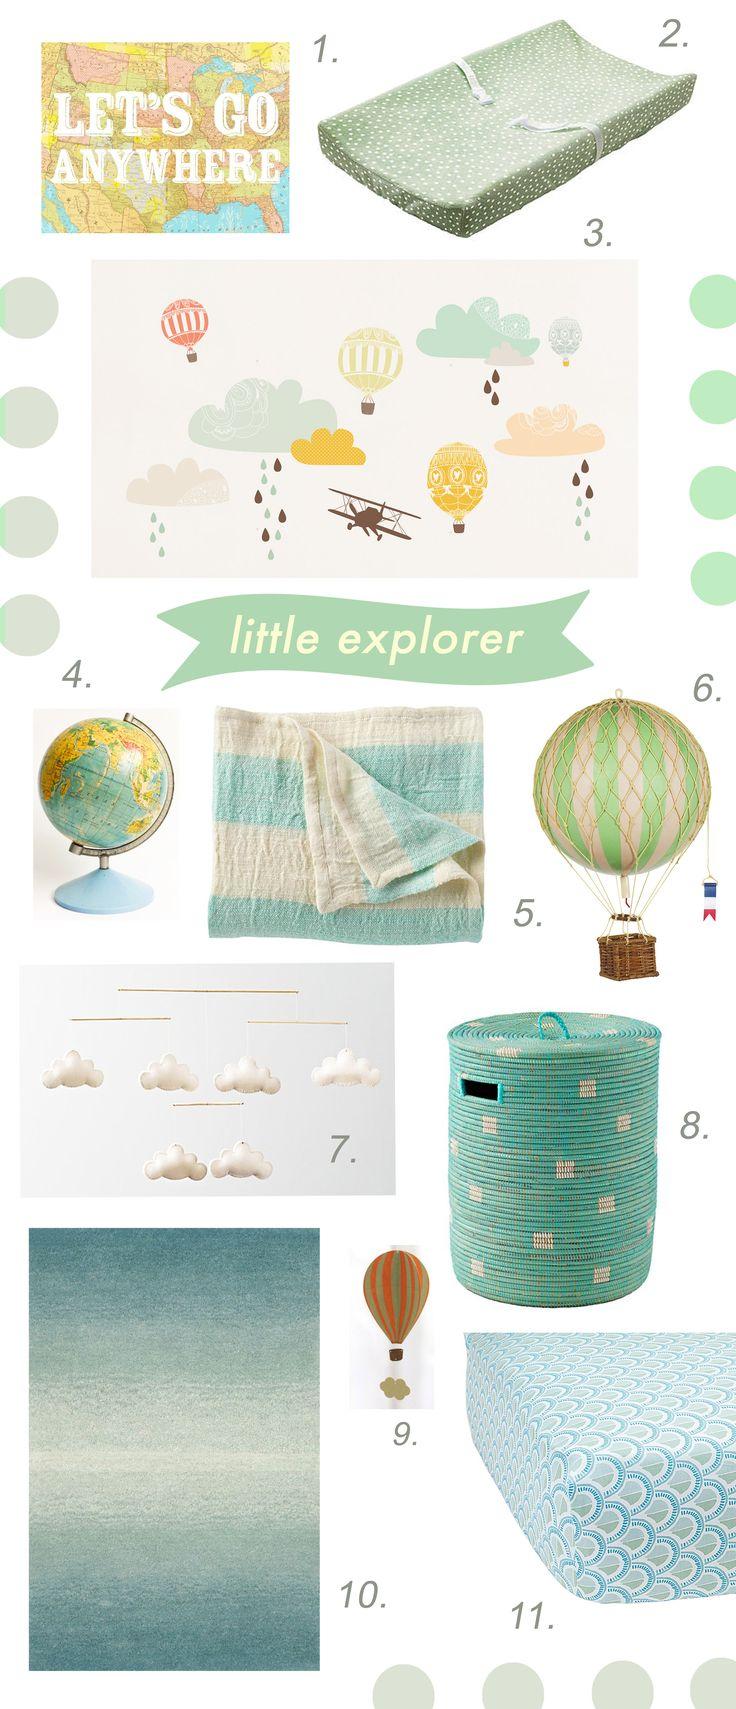 Little Explorer Nursery Theme // by Chachi Loves Design, Los Angeles // for sources visit: http://chachilovesdesign.tumblr.com/ @jessielathroum